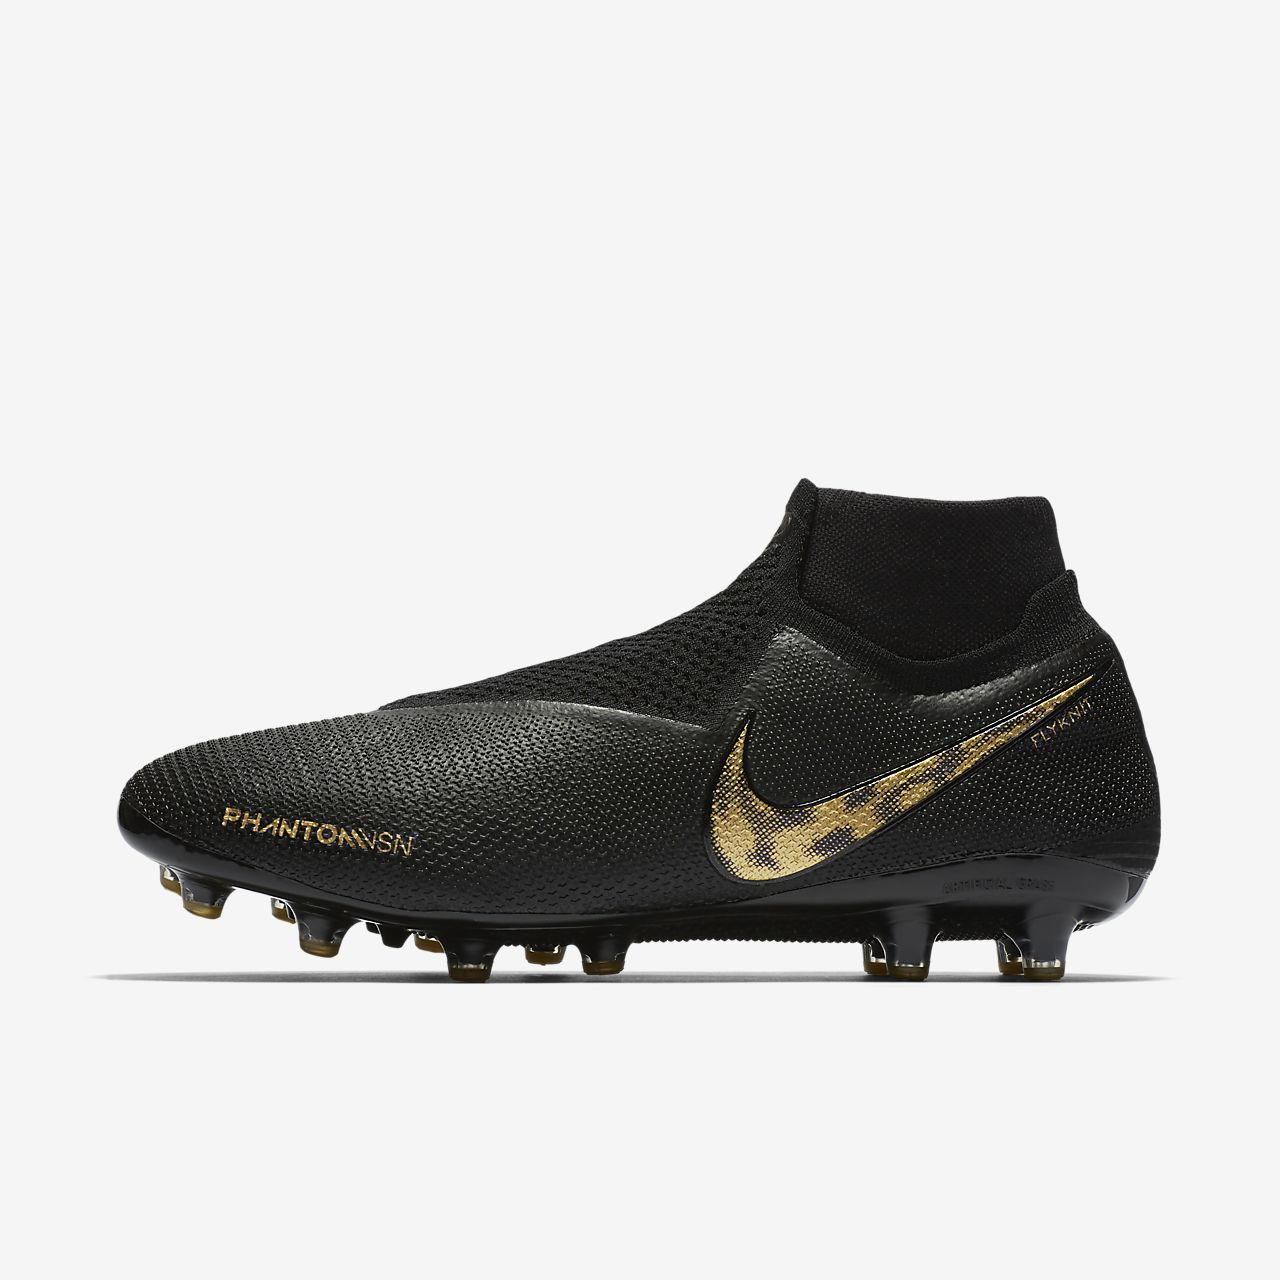 Scarpa Per Calcio Erba Artificiale Elite Nike Phantom Vision Da kuOPXTZi